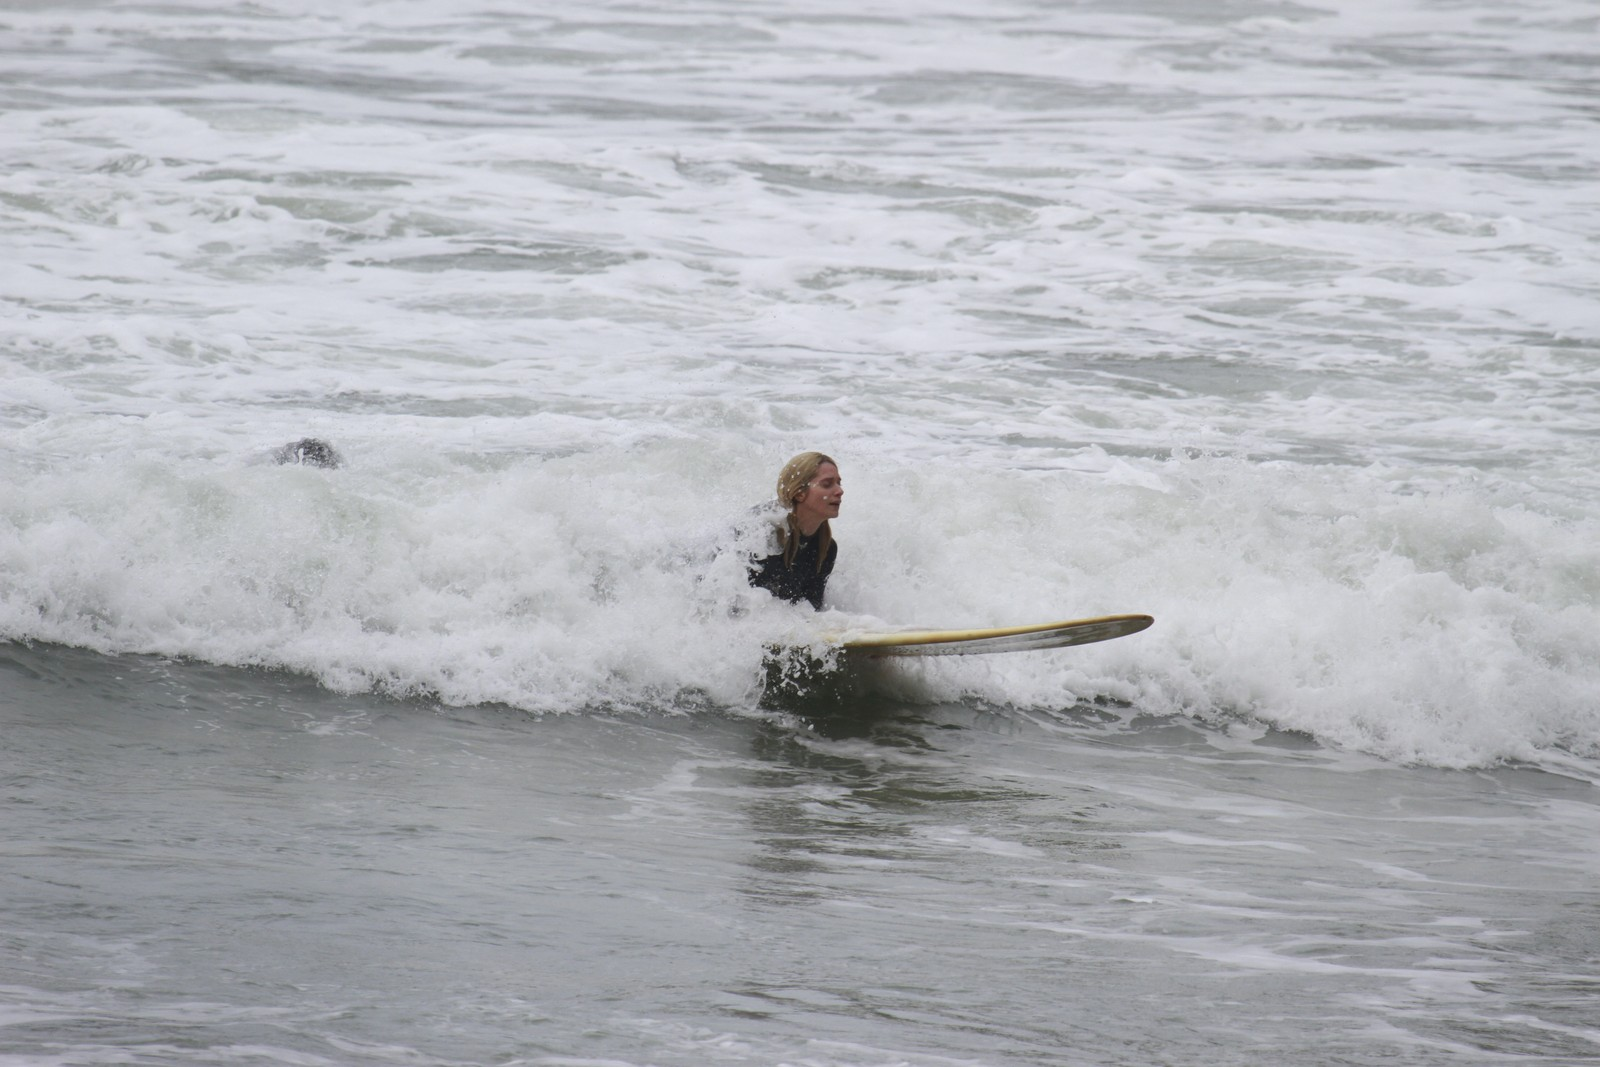 Leticia Spiller se arrisca na prancha de surfe